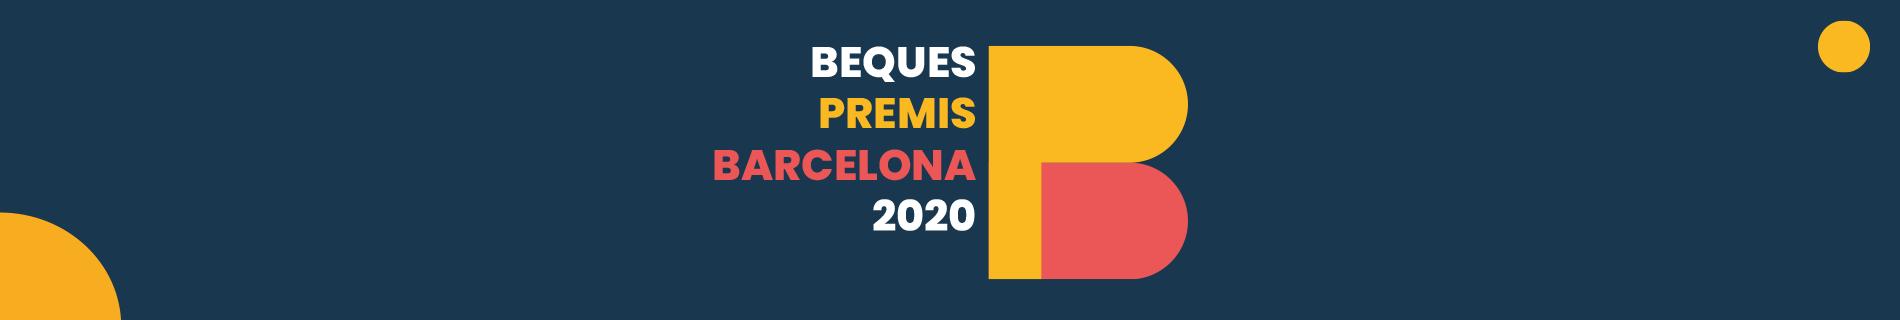 Premis Beques Barcelona 2020